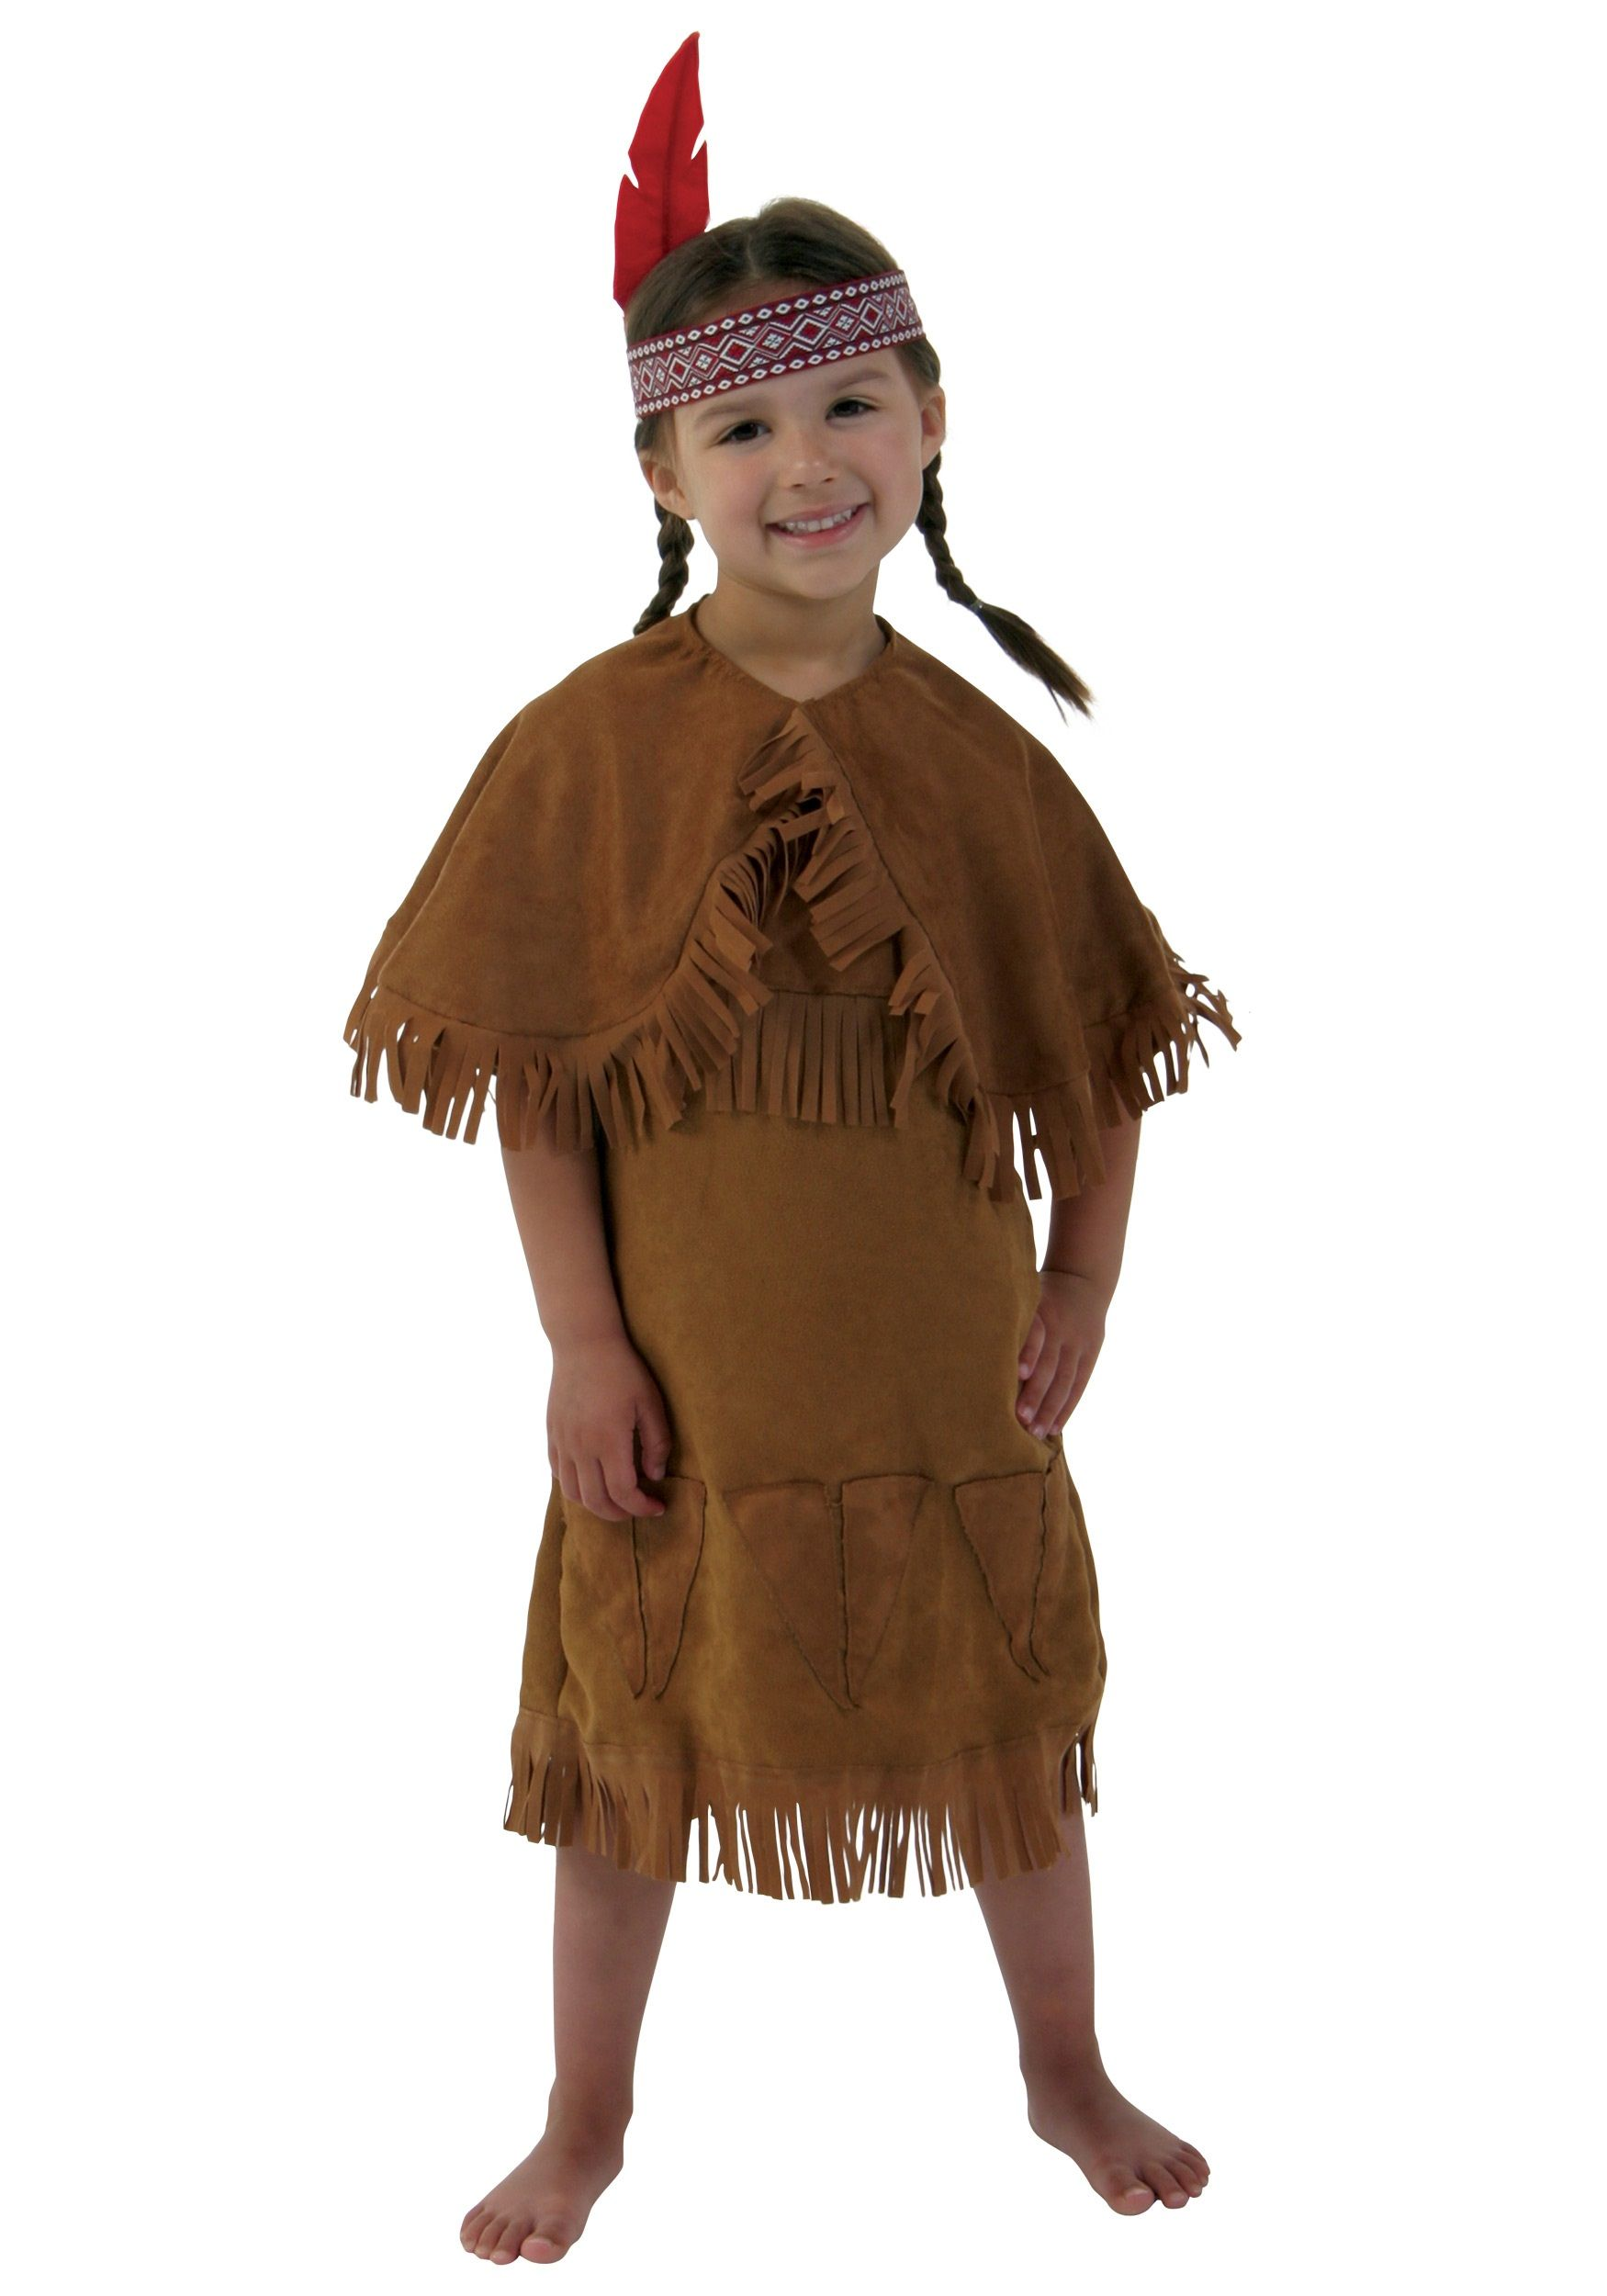 Pocahontas Halloween Costume  Indian Girl Costume Ideas -9109